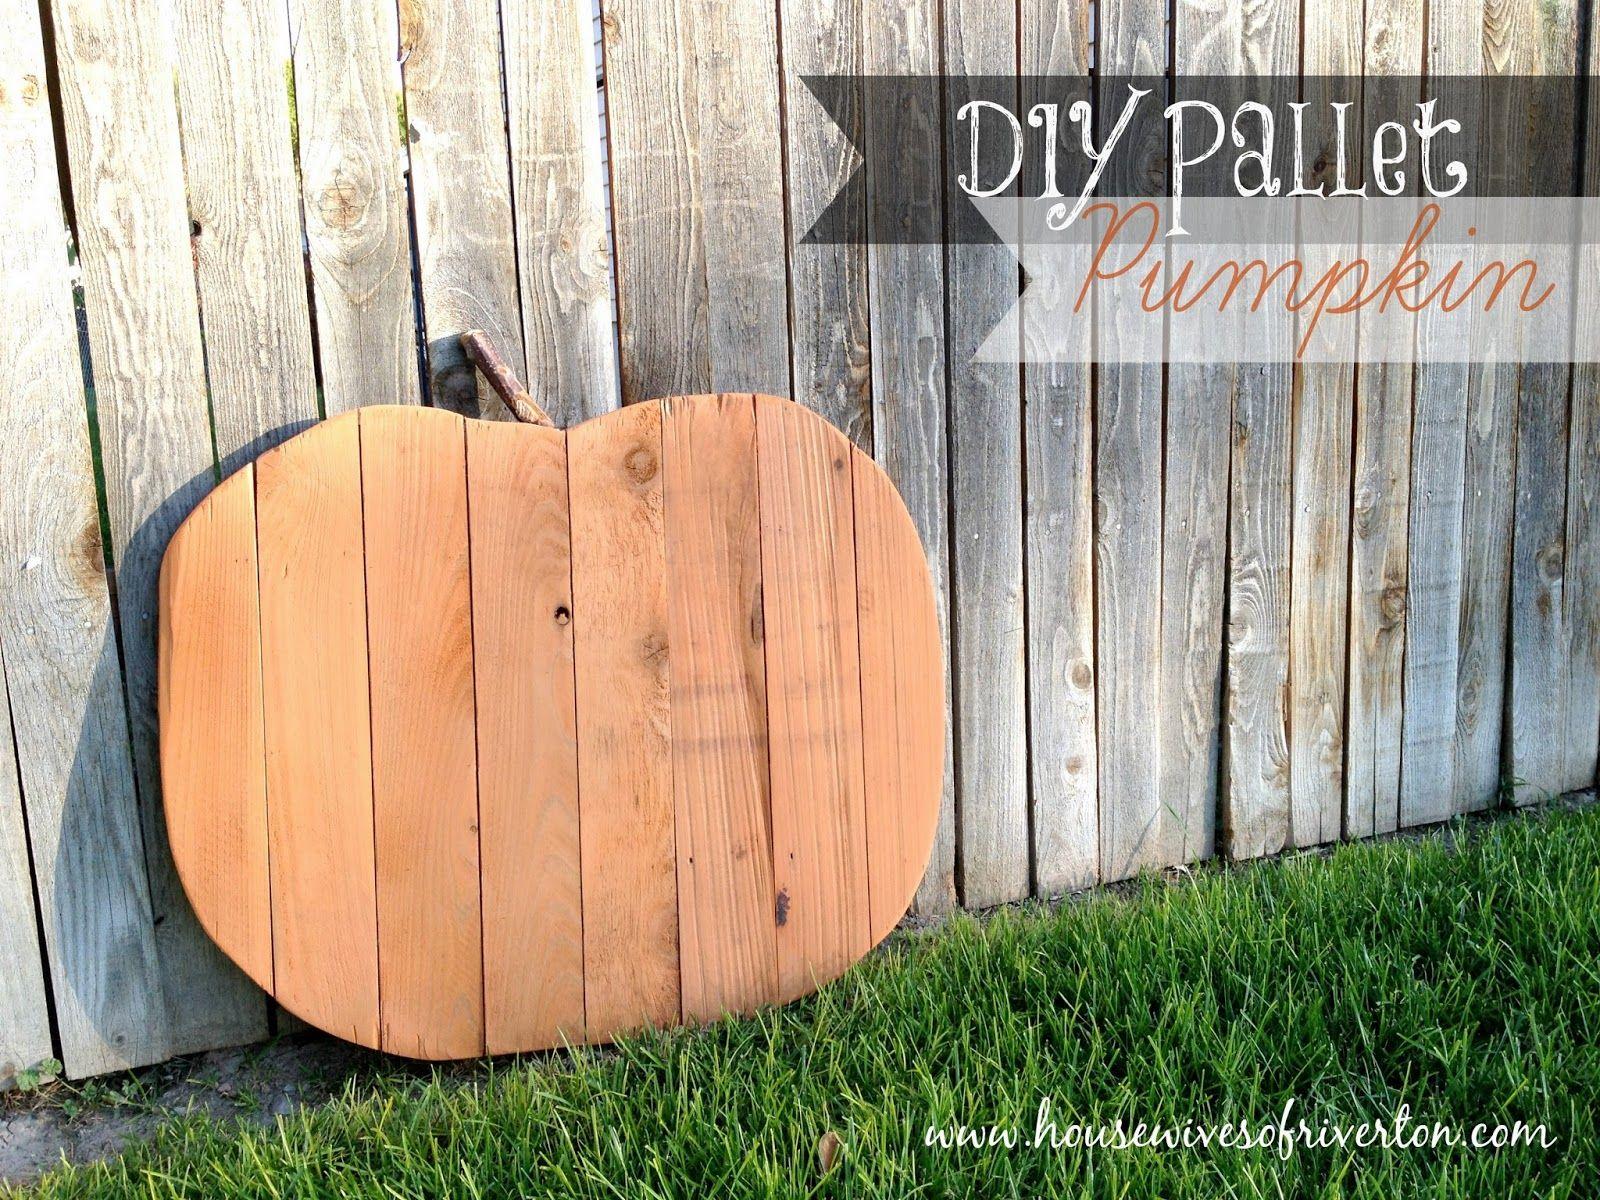 DIY Pallet Pumpkin | Pallet pumpkin, Wood pallet crafts ...